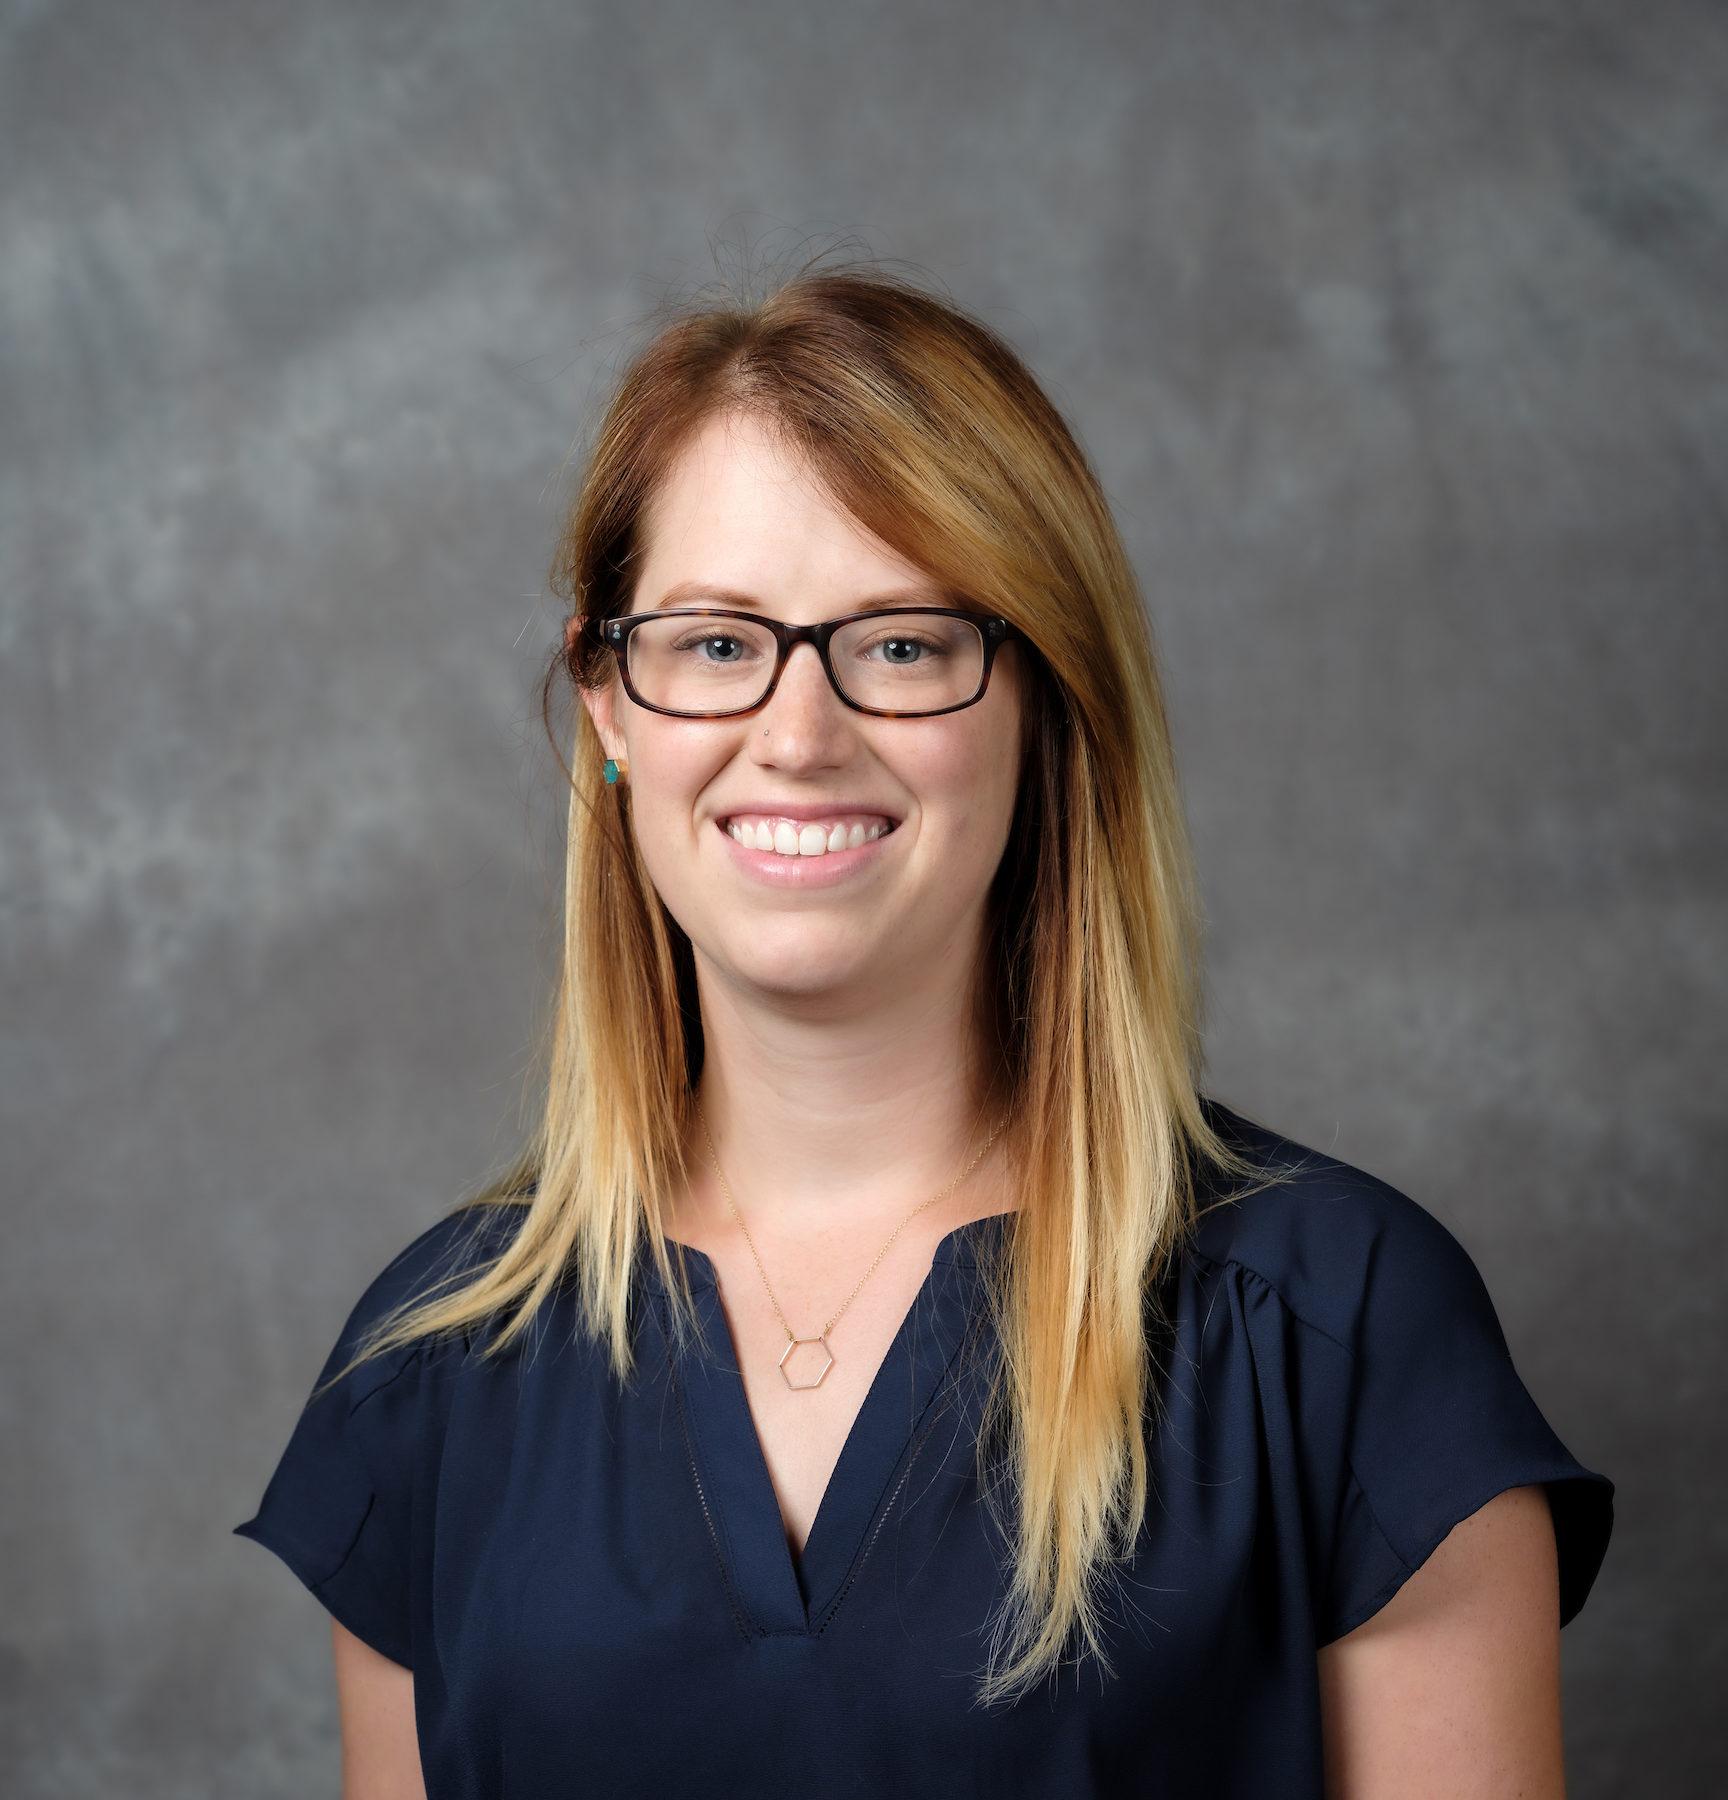 Dr. Melissa Kenny